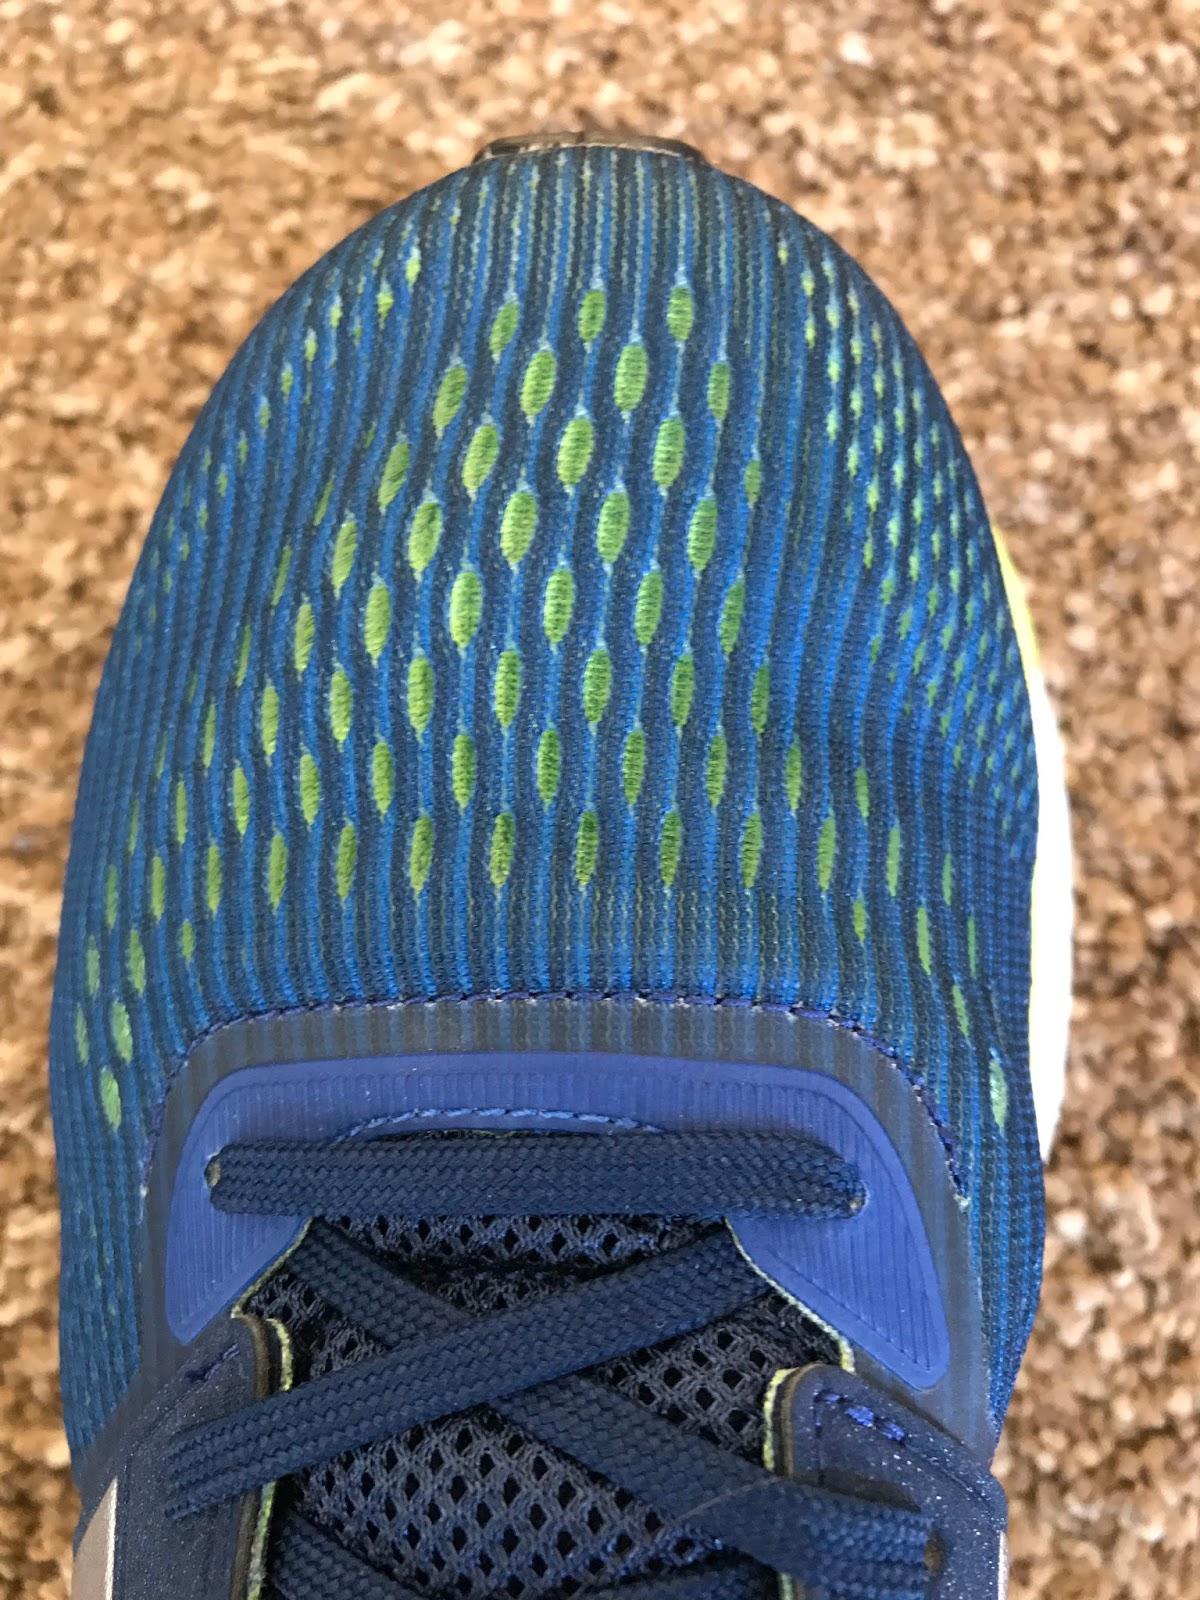 Road Trail Run: adidas Supernova Glide 9 Review: Rebounding